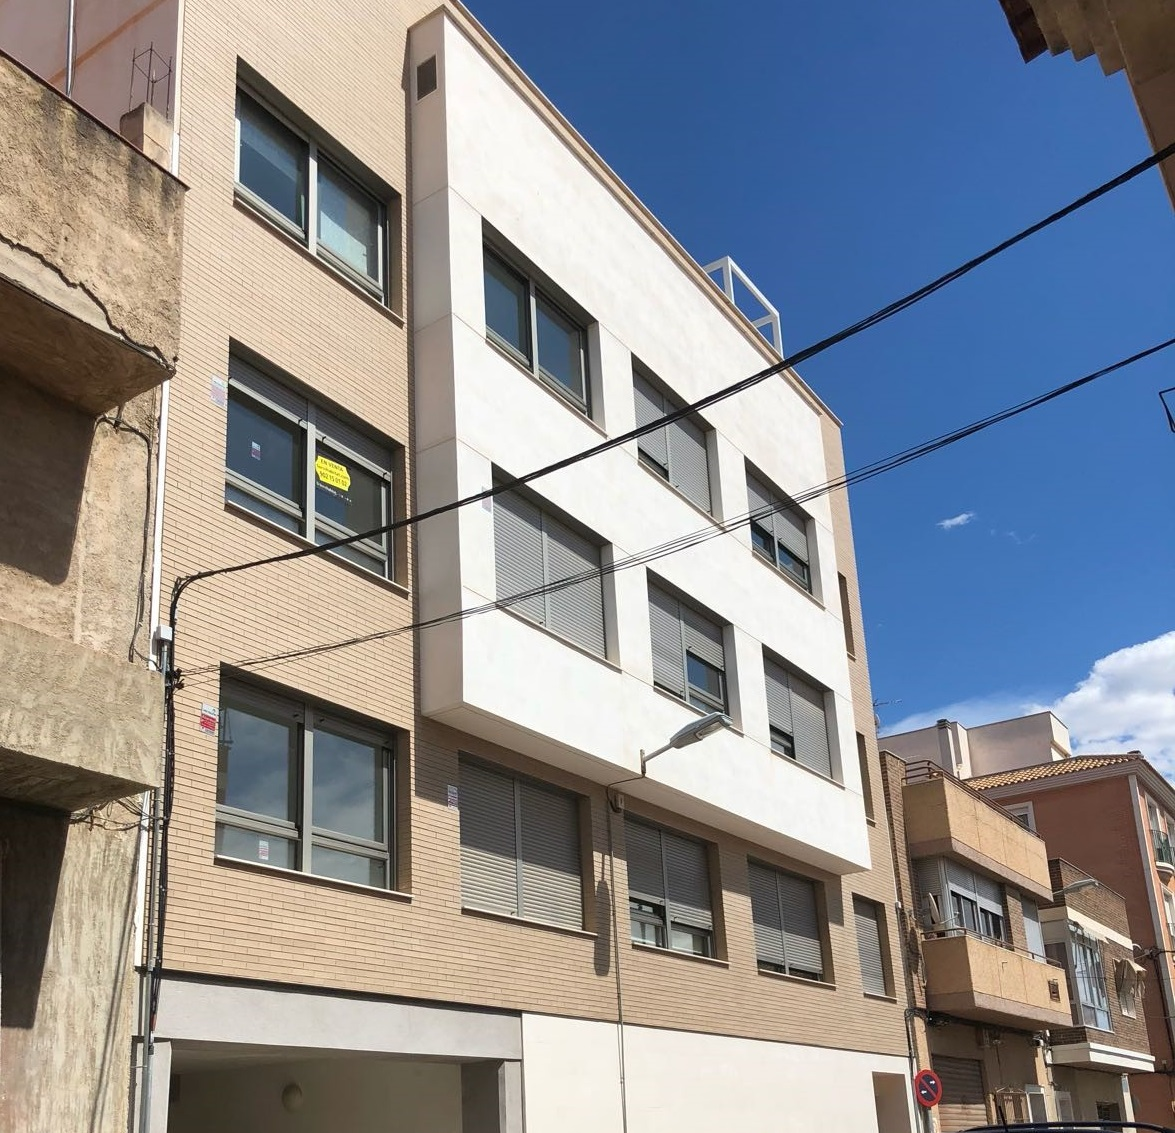 Piso en venta en Murcia, Murcia, Murcia, Calle Escultor Noguera Valverde, 57.700 €, 1 habitación, 1 baño, 53 m2